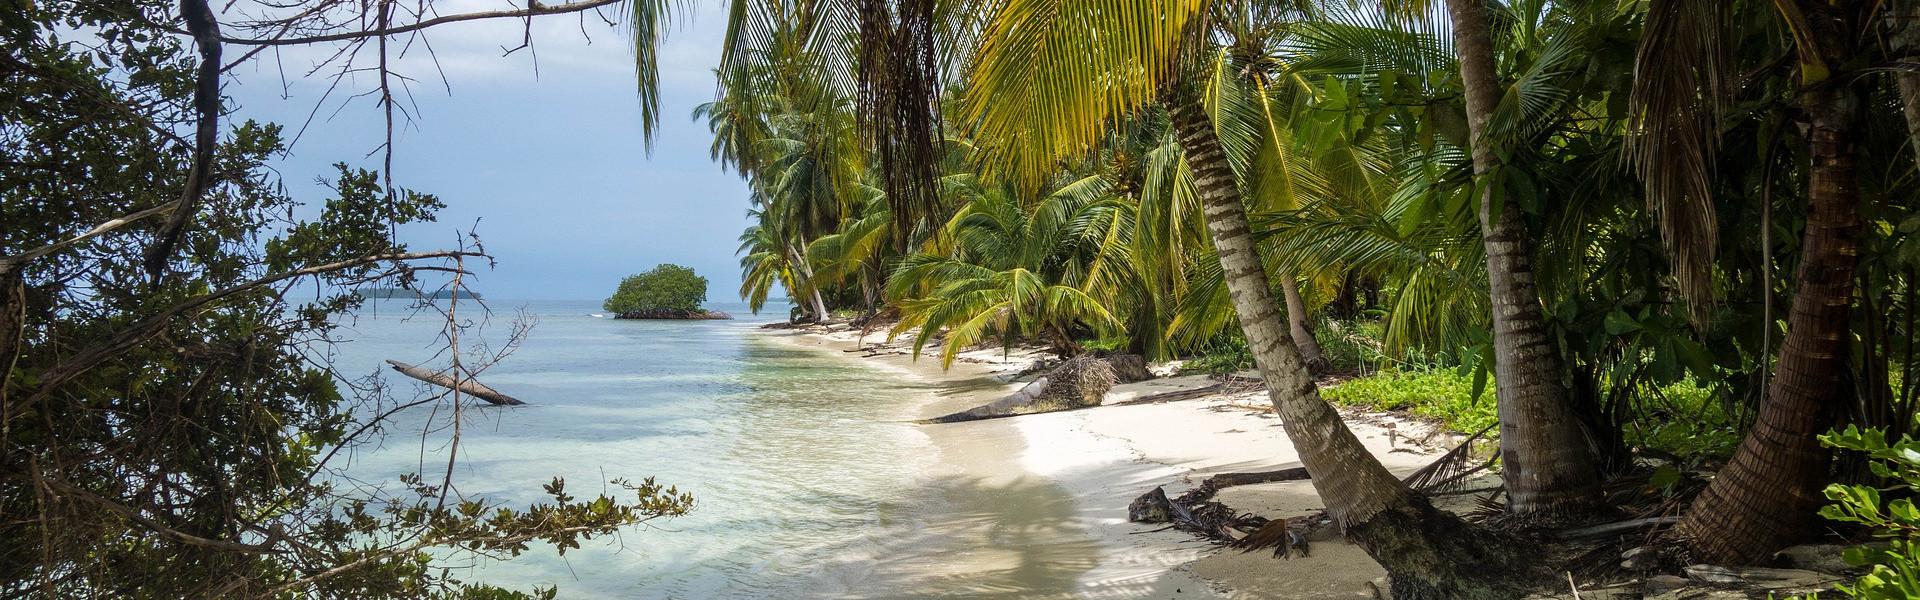 Destination image of Caraïbes